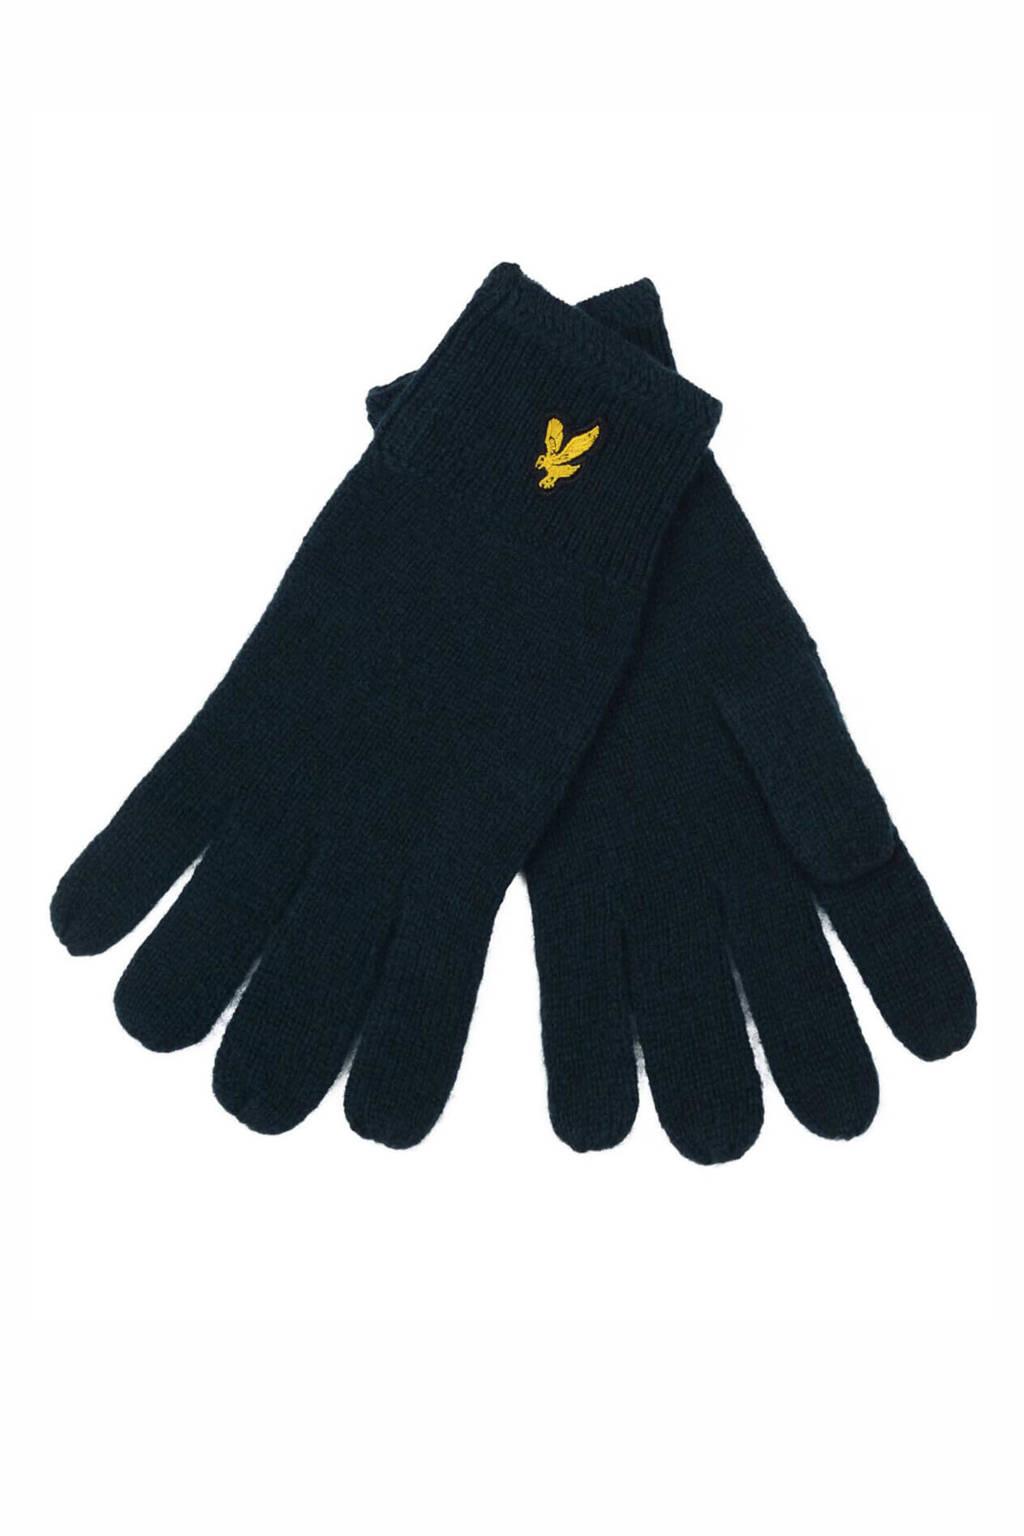 Lyle & Scott handschoenen donkerblauw, Donkerblauw